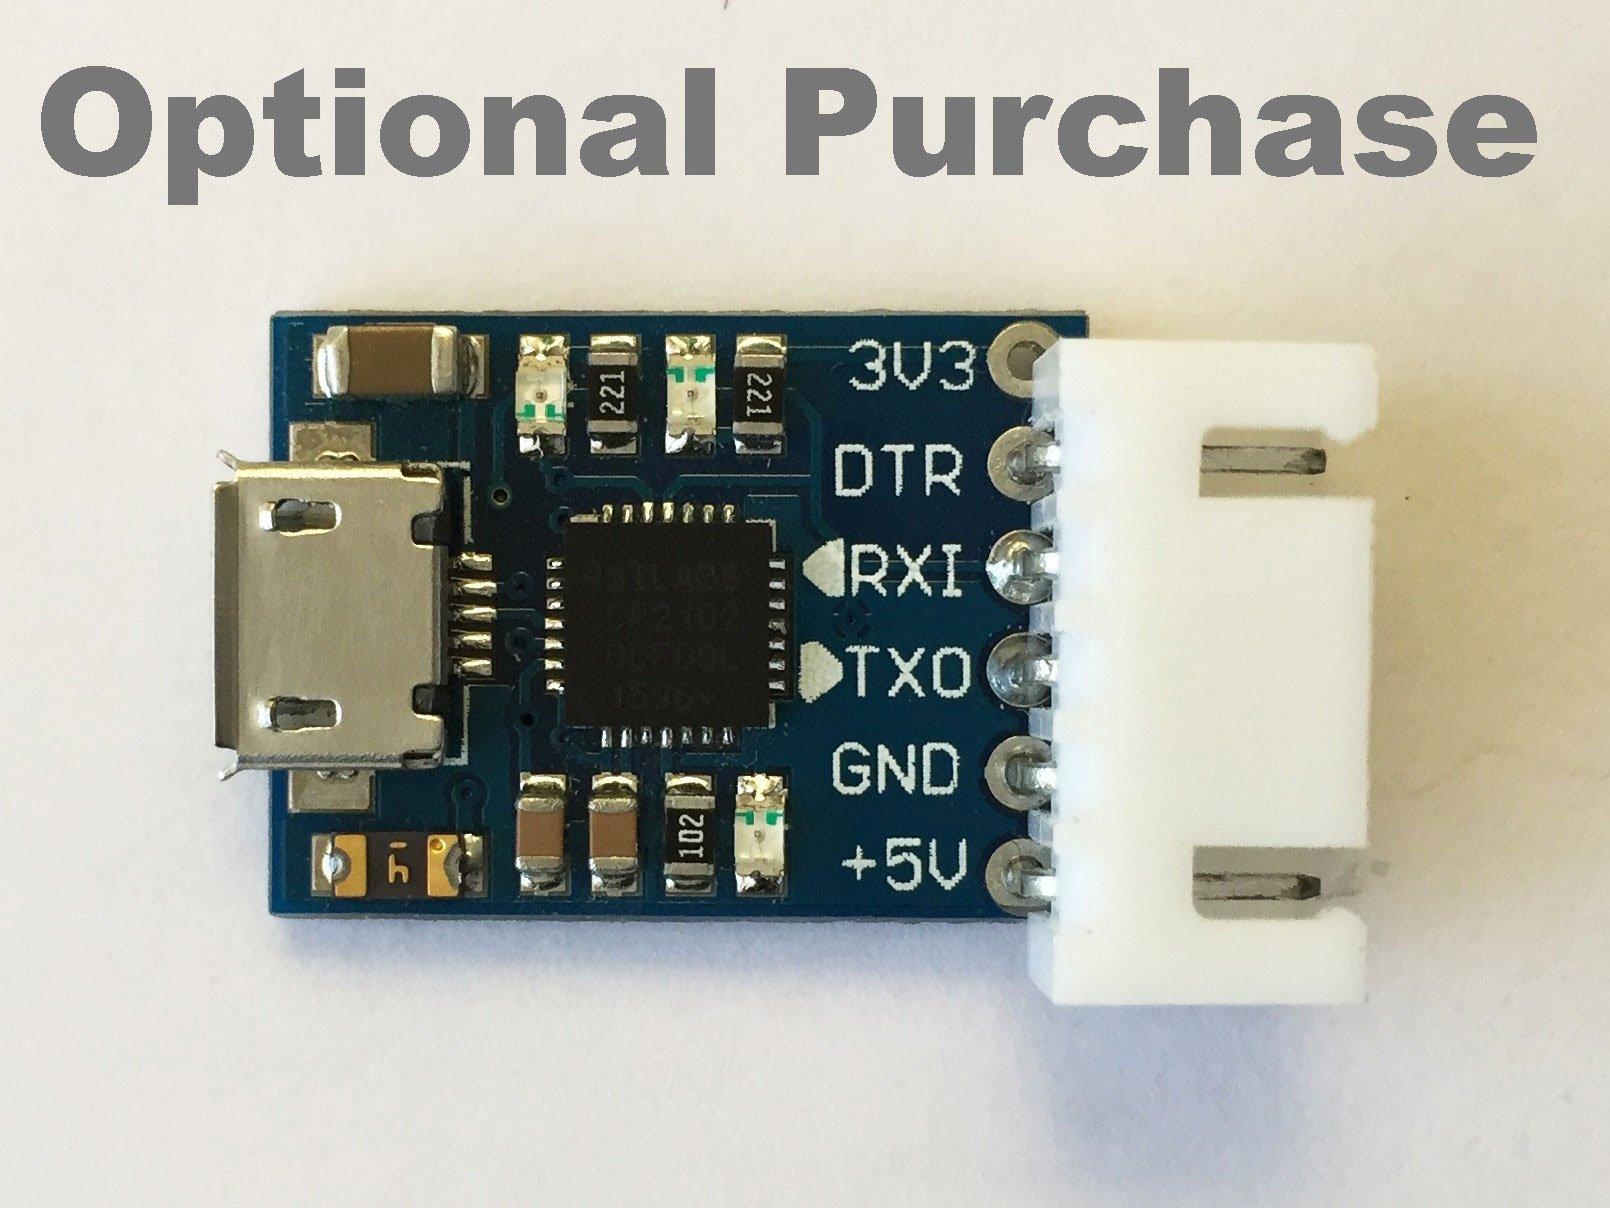 Naked Mega 2 Arduino Mega 2560 compatible board from